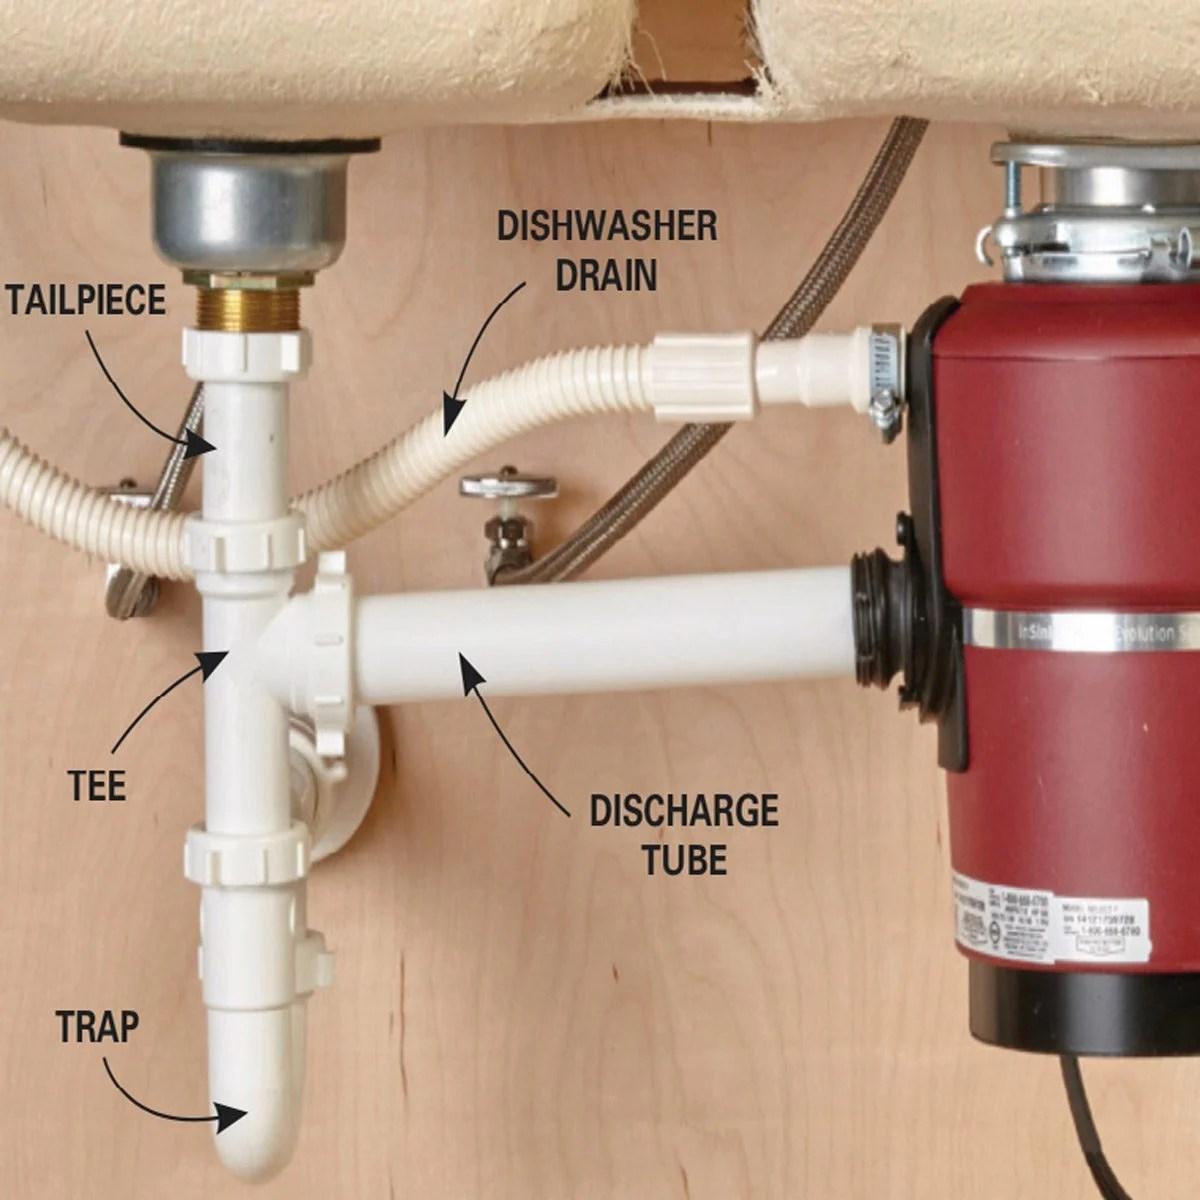 Dishwasher Plumbing Diagram Proper Setup For Double Sink Plumbing